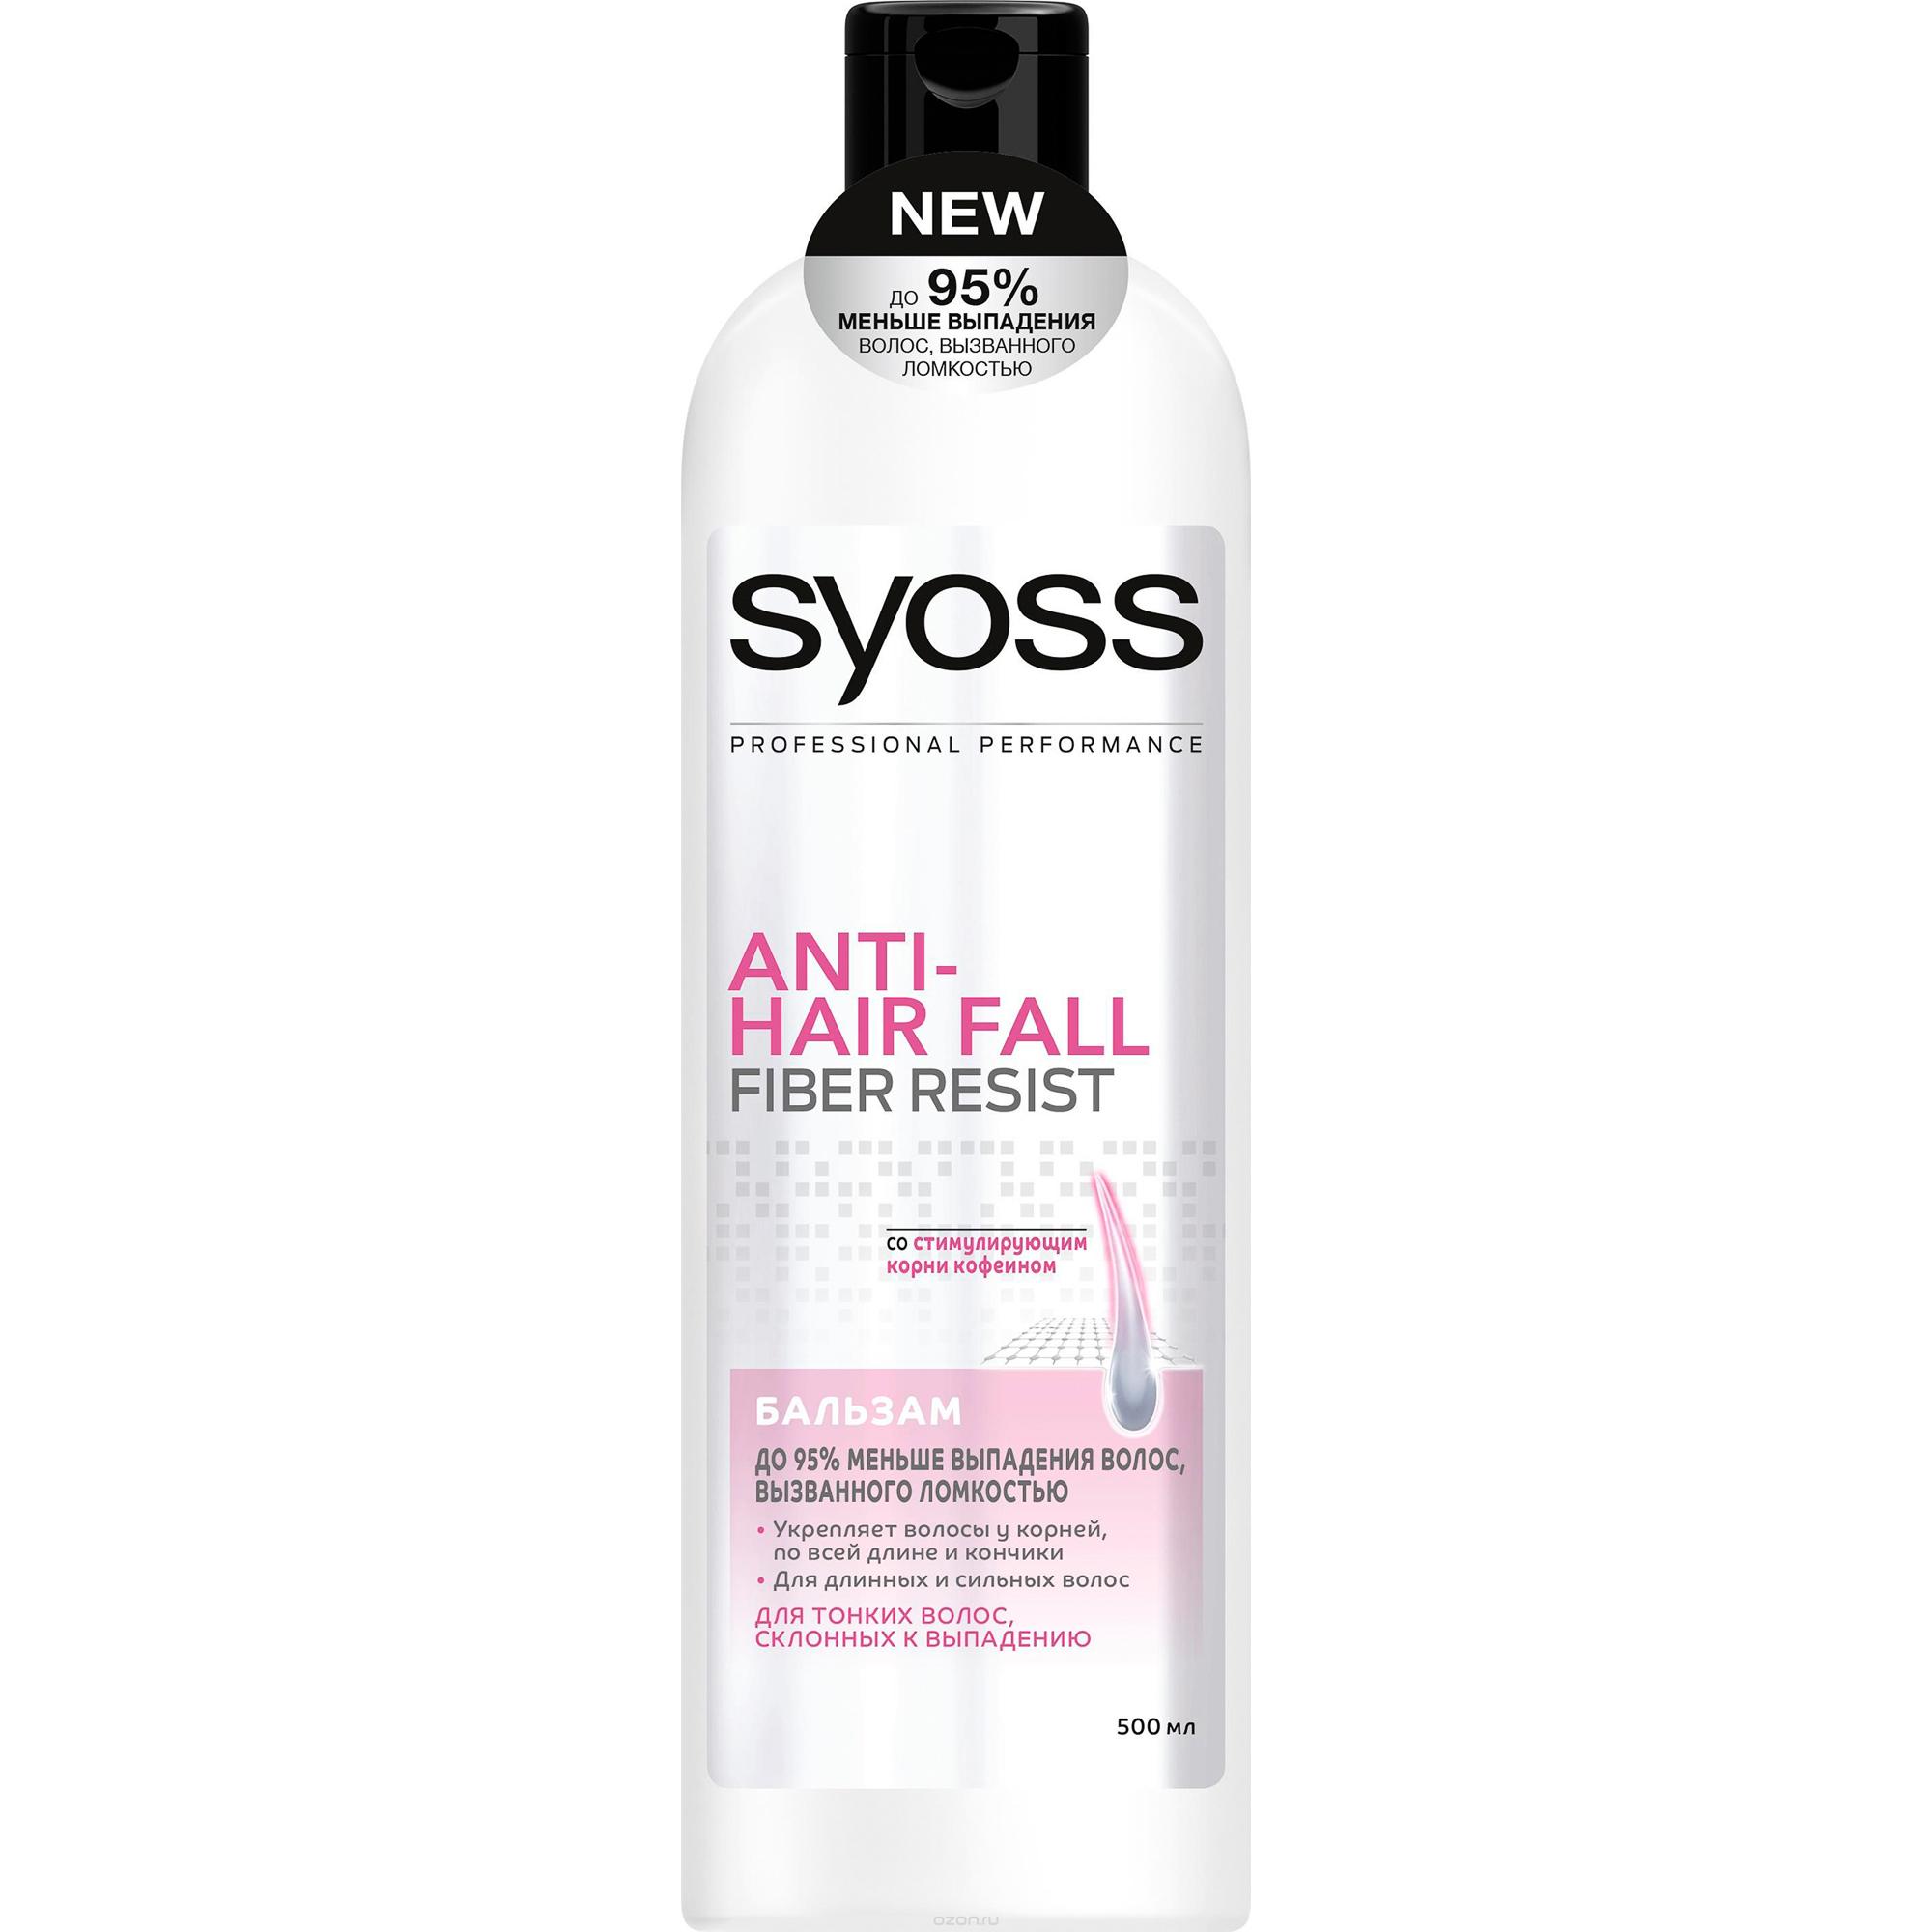 Фото - Бальзам SYOSS Anti-Hair Fall Fiber Resist 95 для склонных к выпадению волос 500 мл бальзам syoss anti hair fall fiber resist 95 для склонных к выпадению волос 500 мл